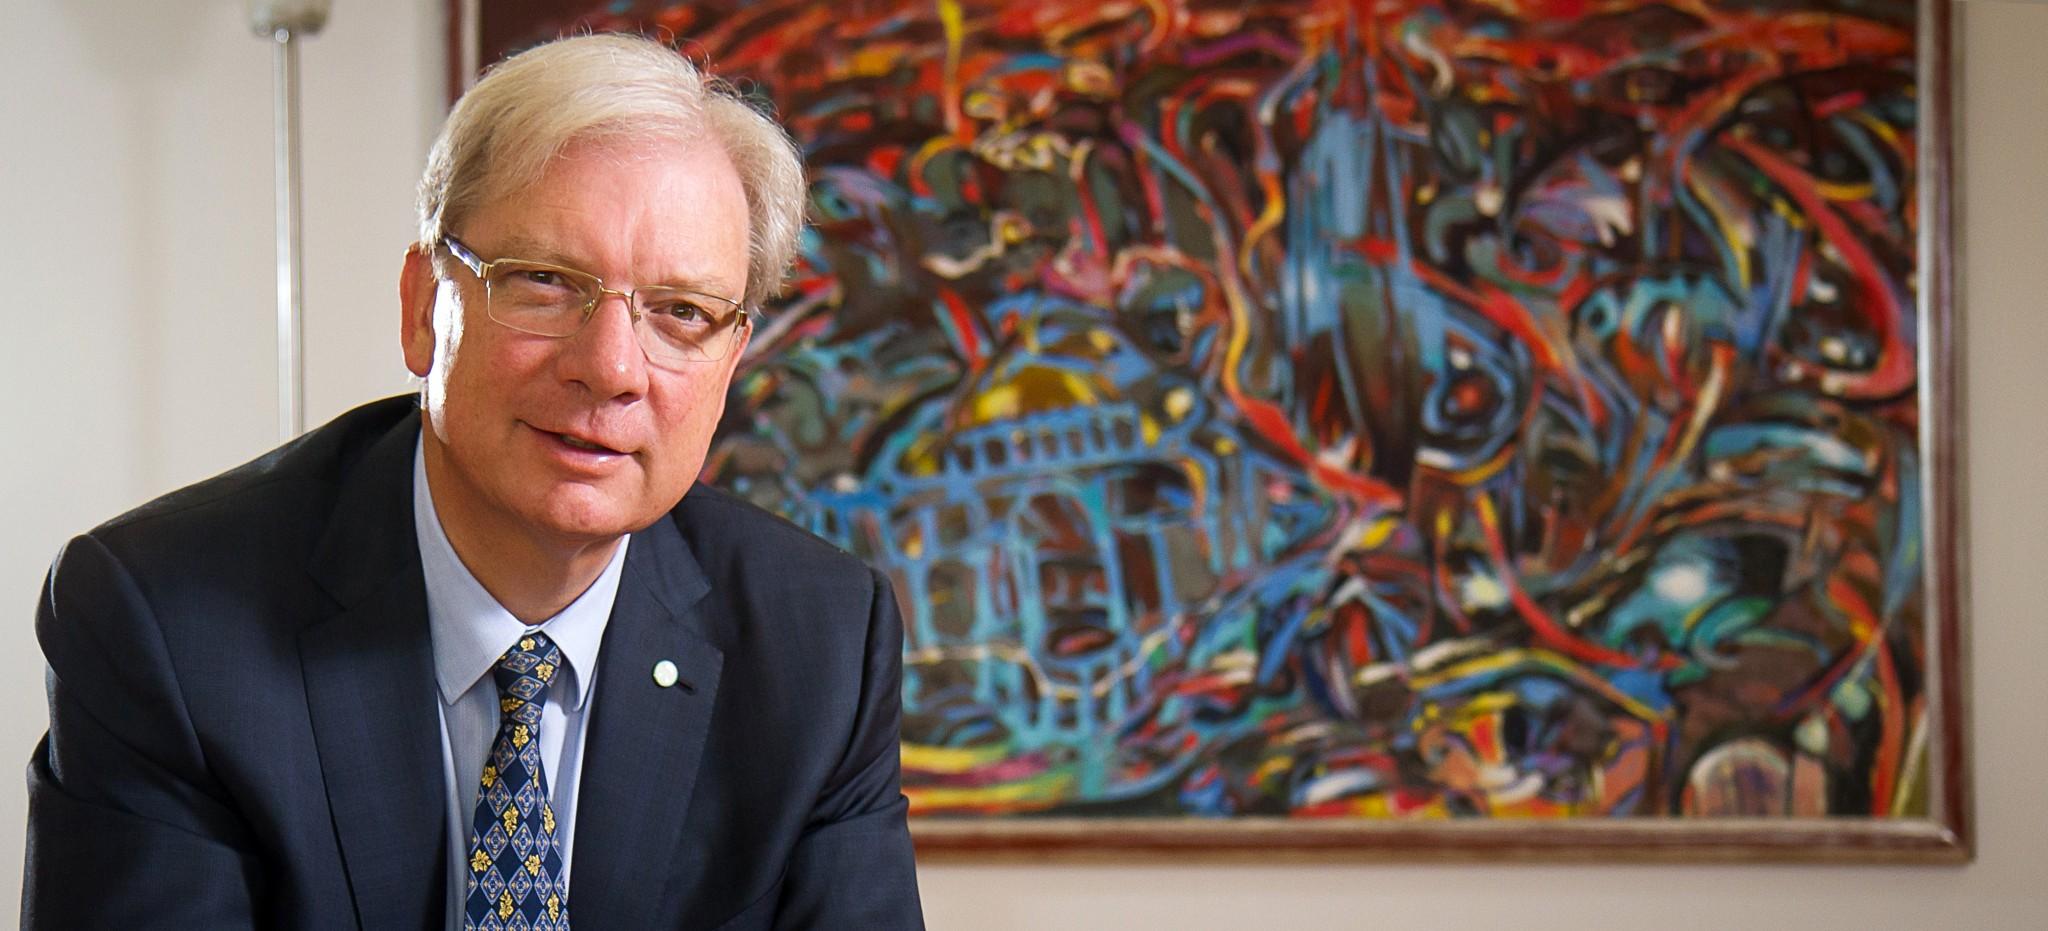 Kurt Soland asume como nuevo gerente general de Bayer Chile